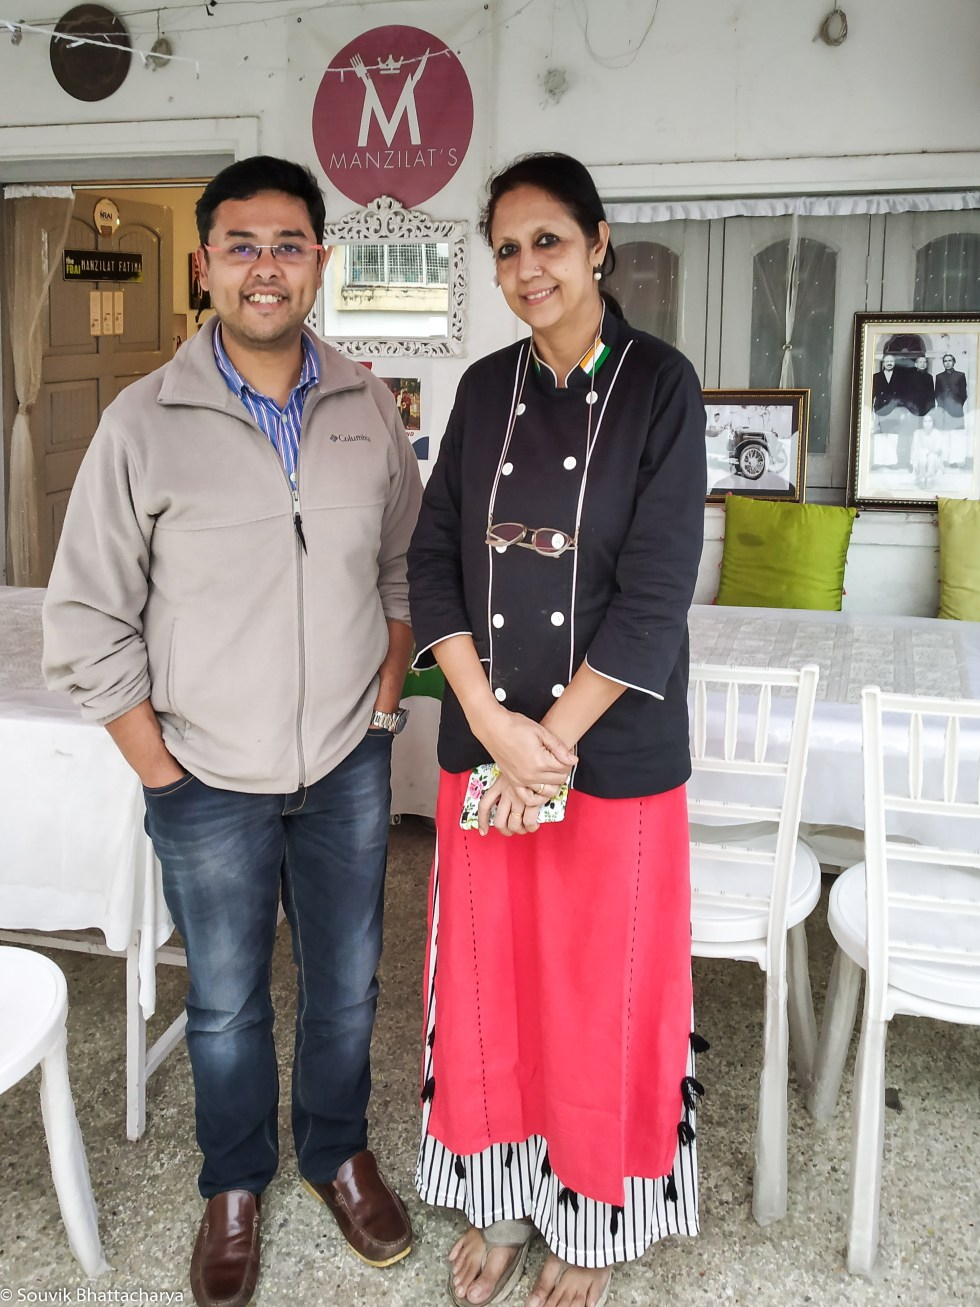 Manzilat Fatima at Manzilat's Kolkata